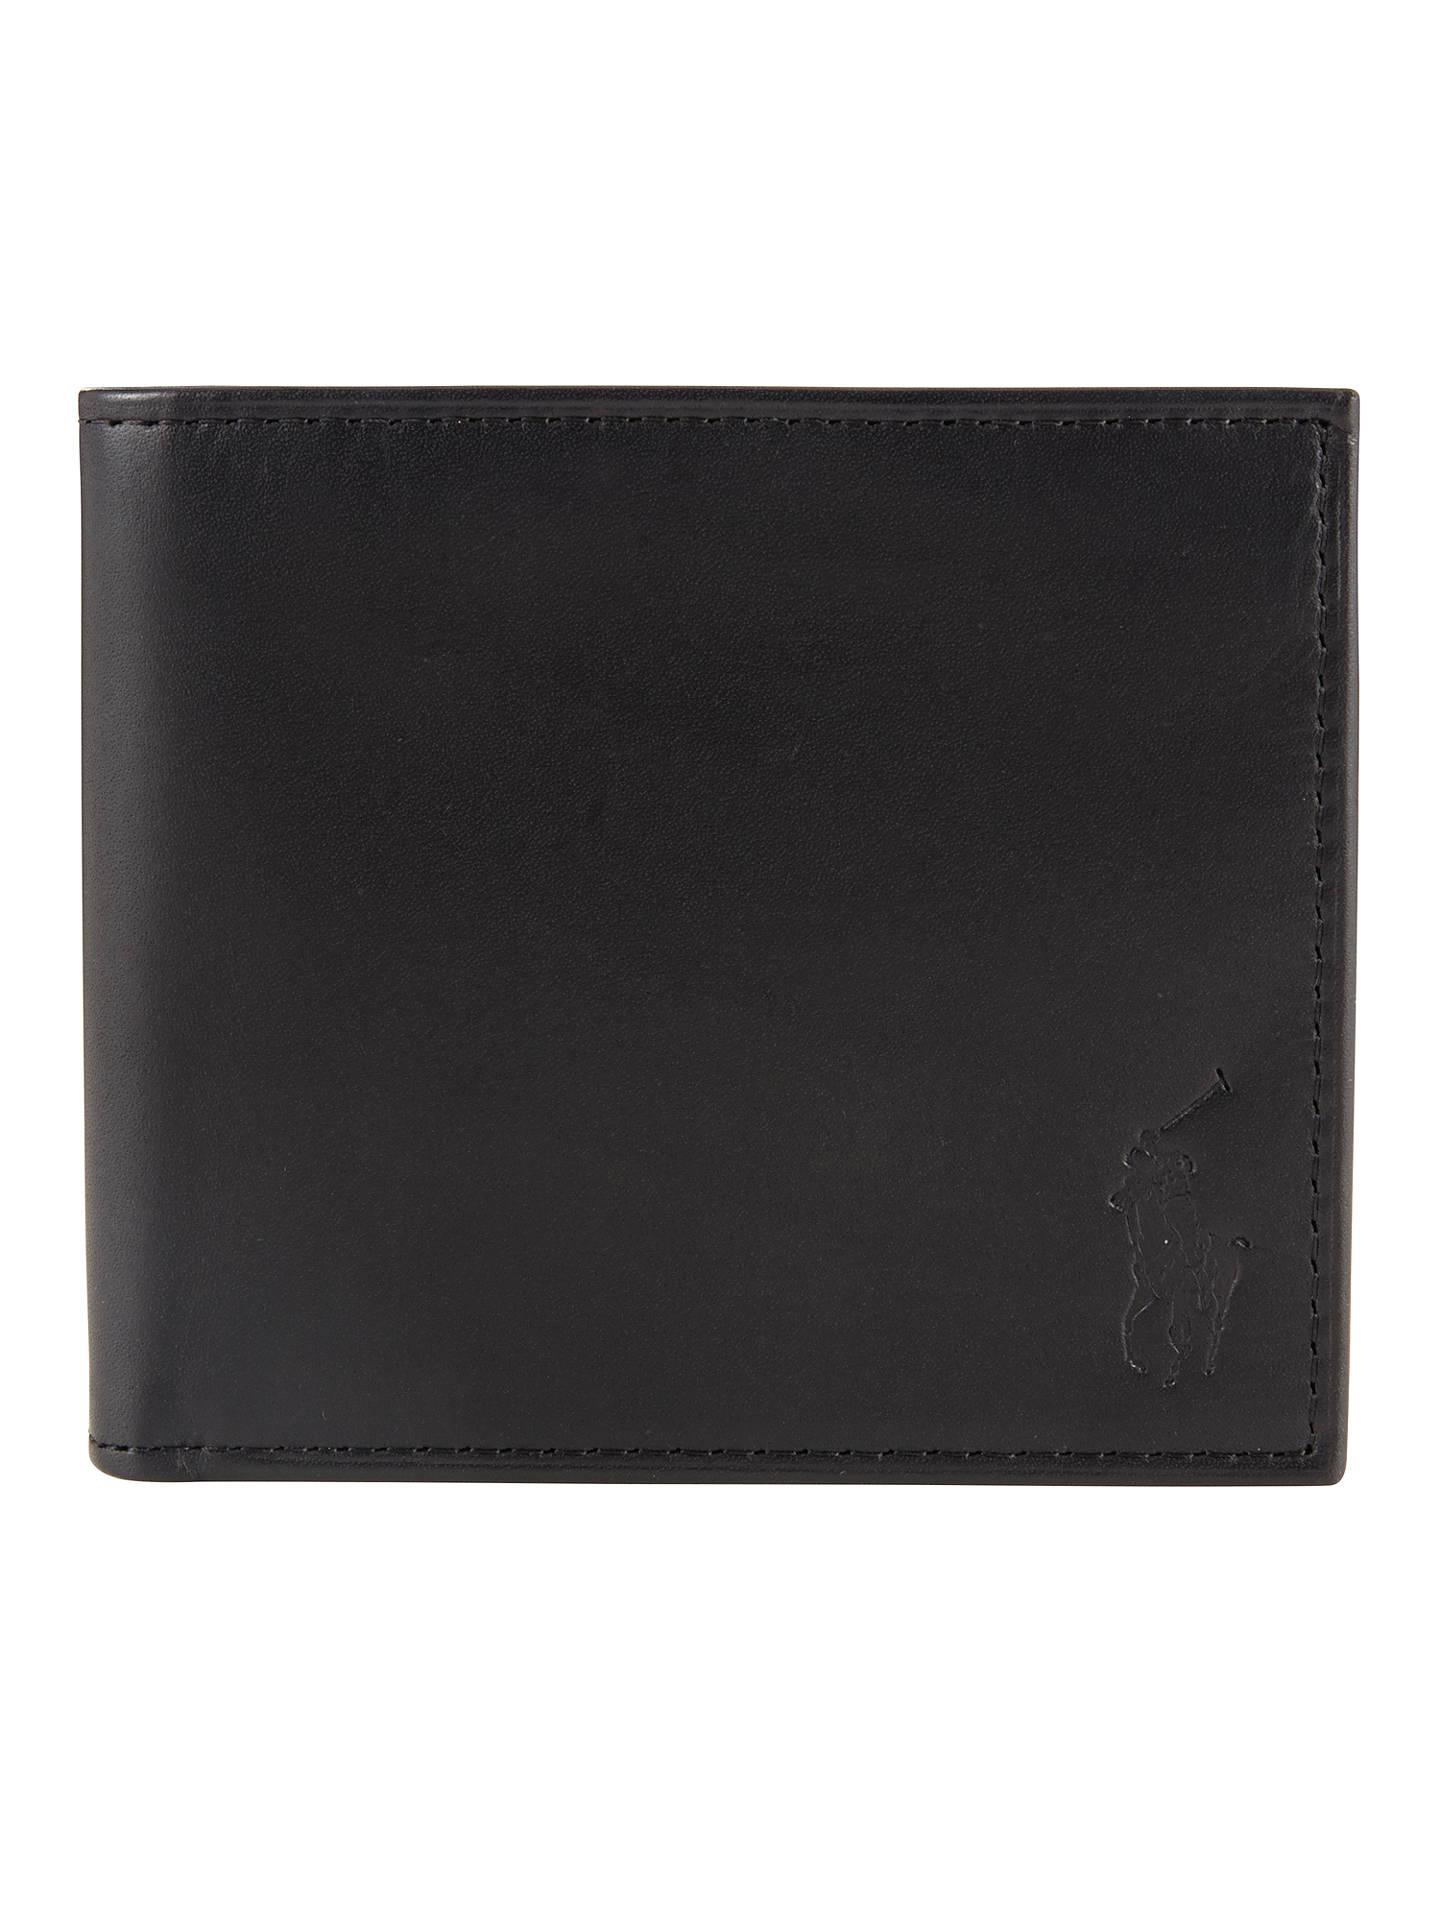 beebbcf8e989 Buy Polo Ralph Lauren Leather Billfold Wallet, Black Online at  johnlewis.com ...